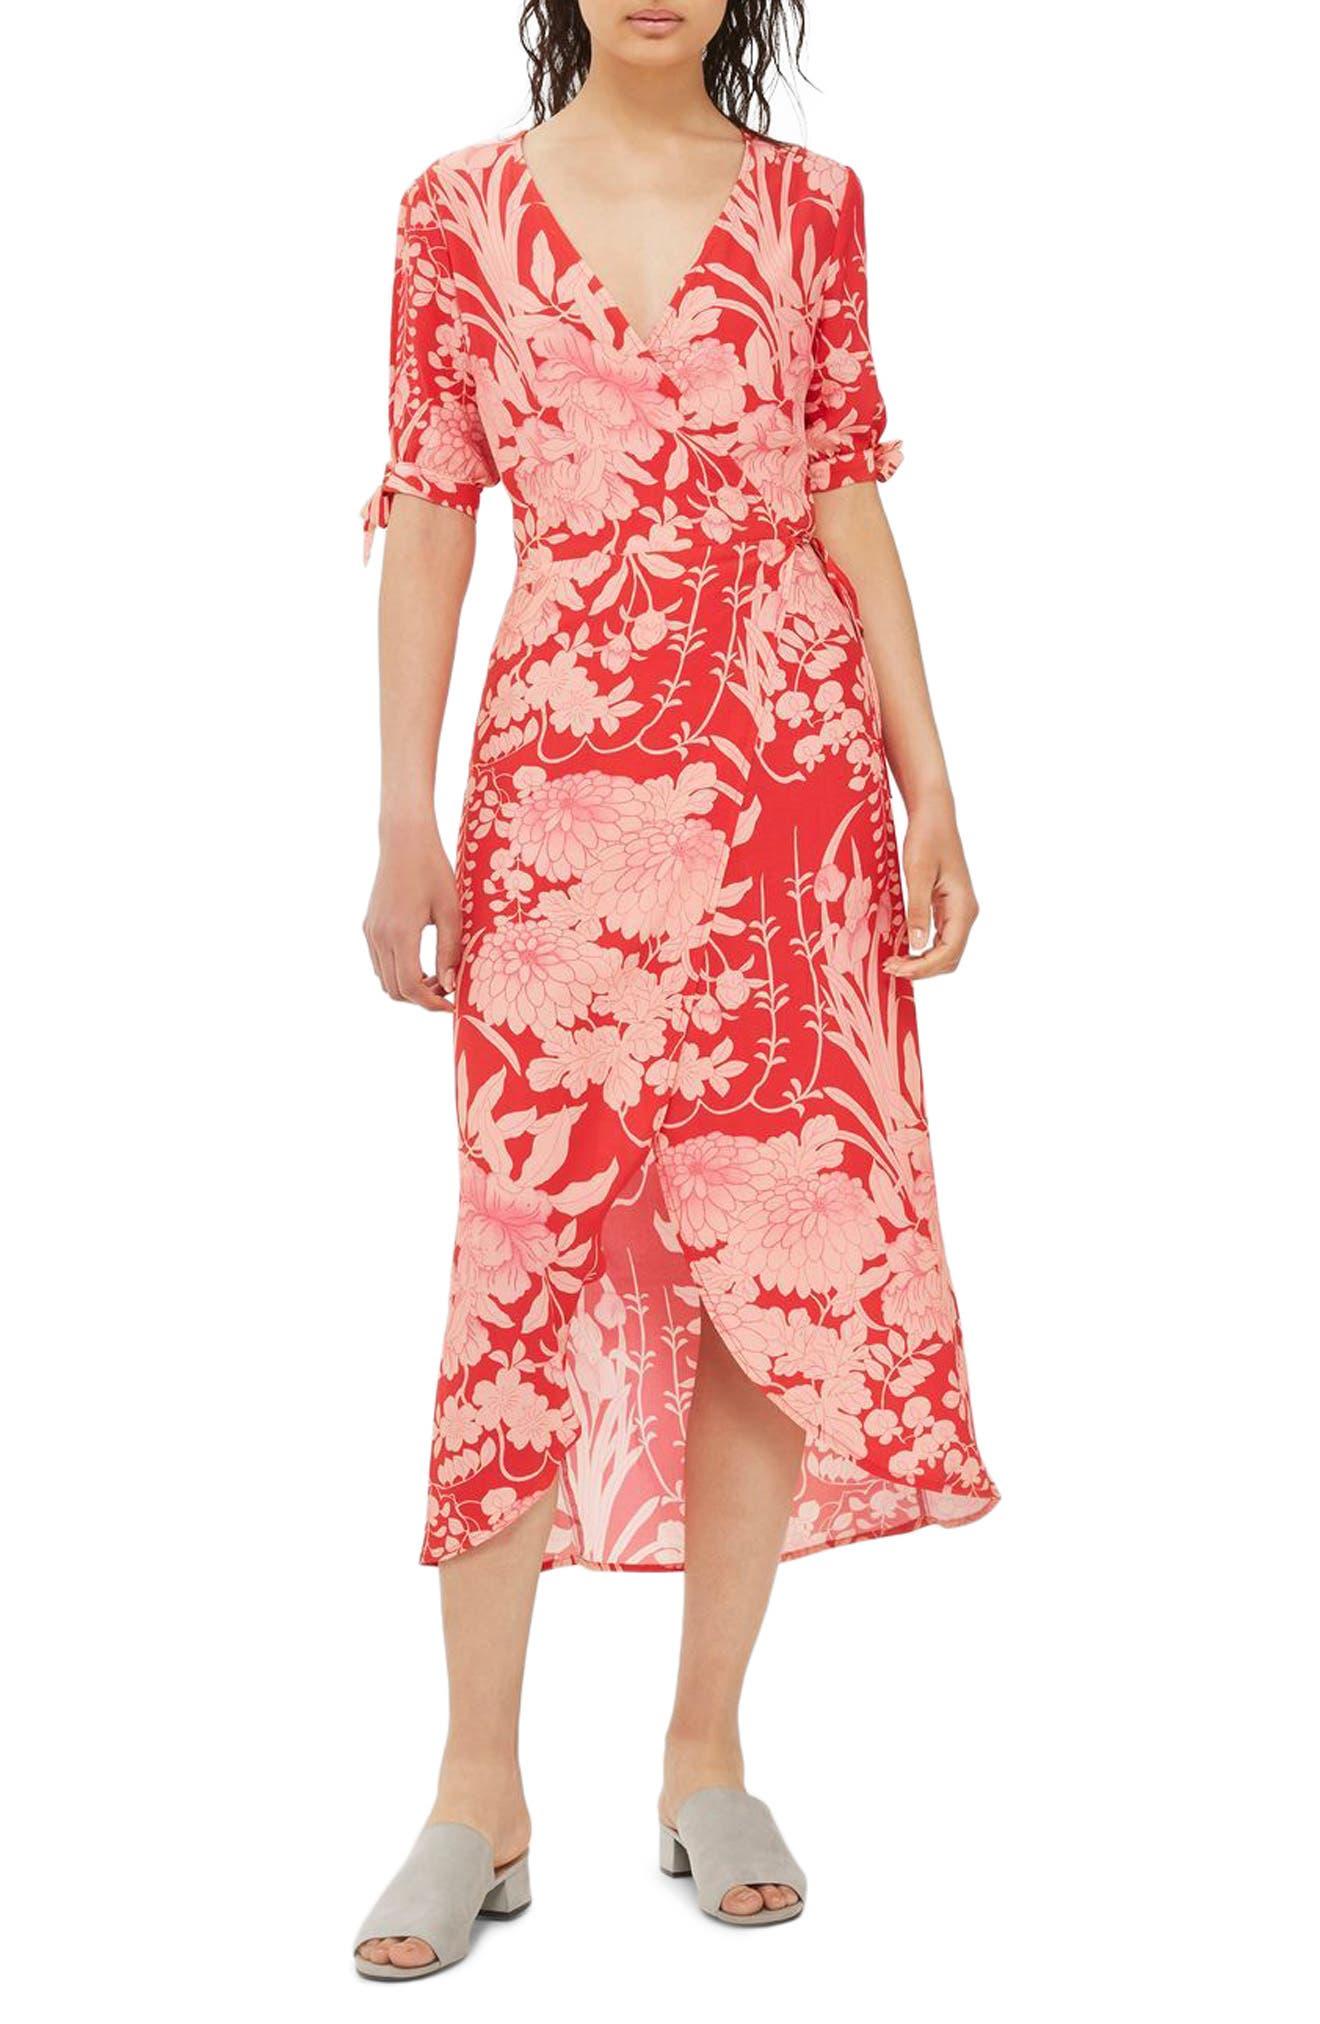 Alternate Image 1 Selected - Topshop Floral Tie Sleeve Wrap Midi Dress